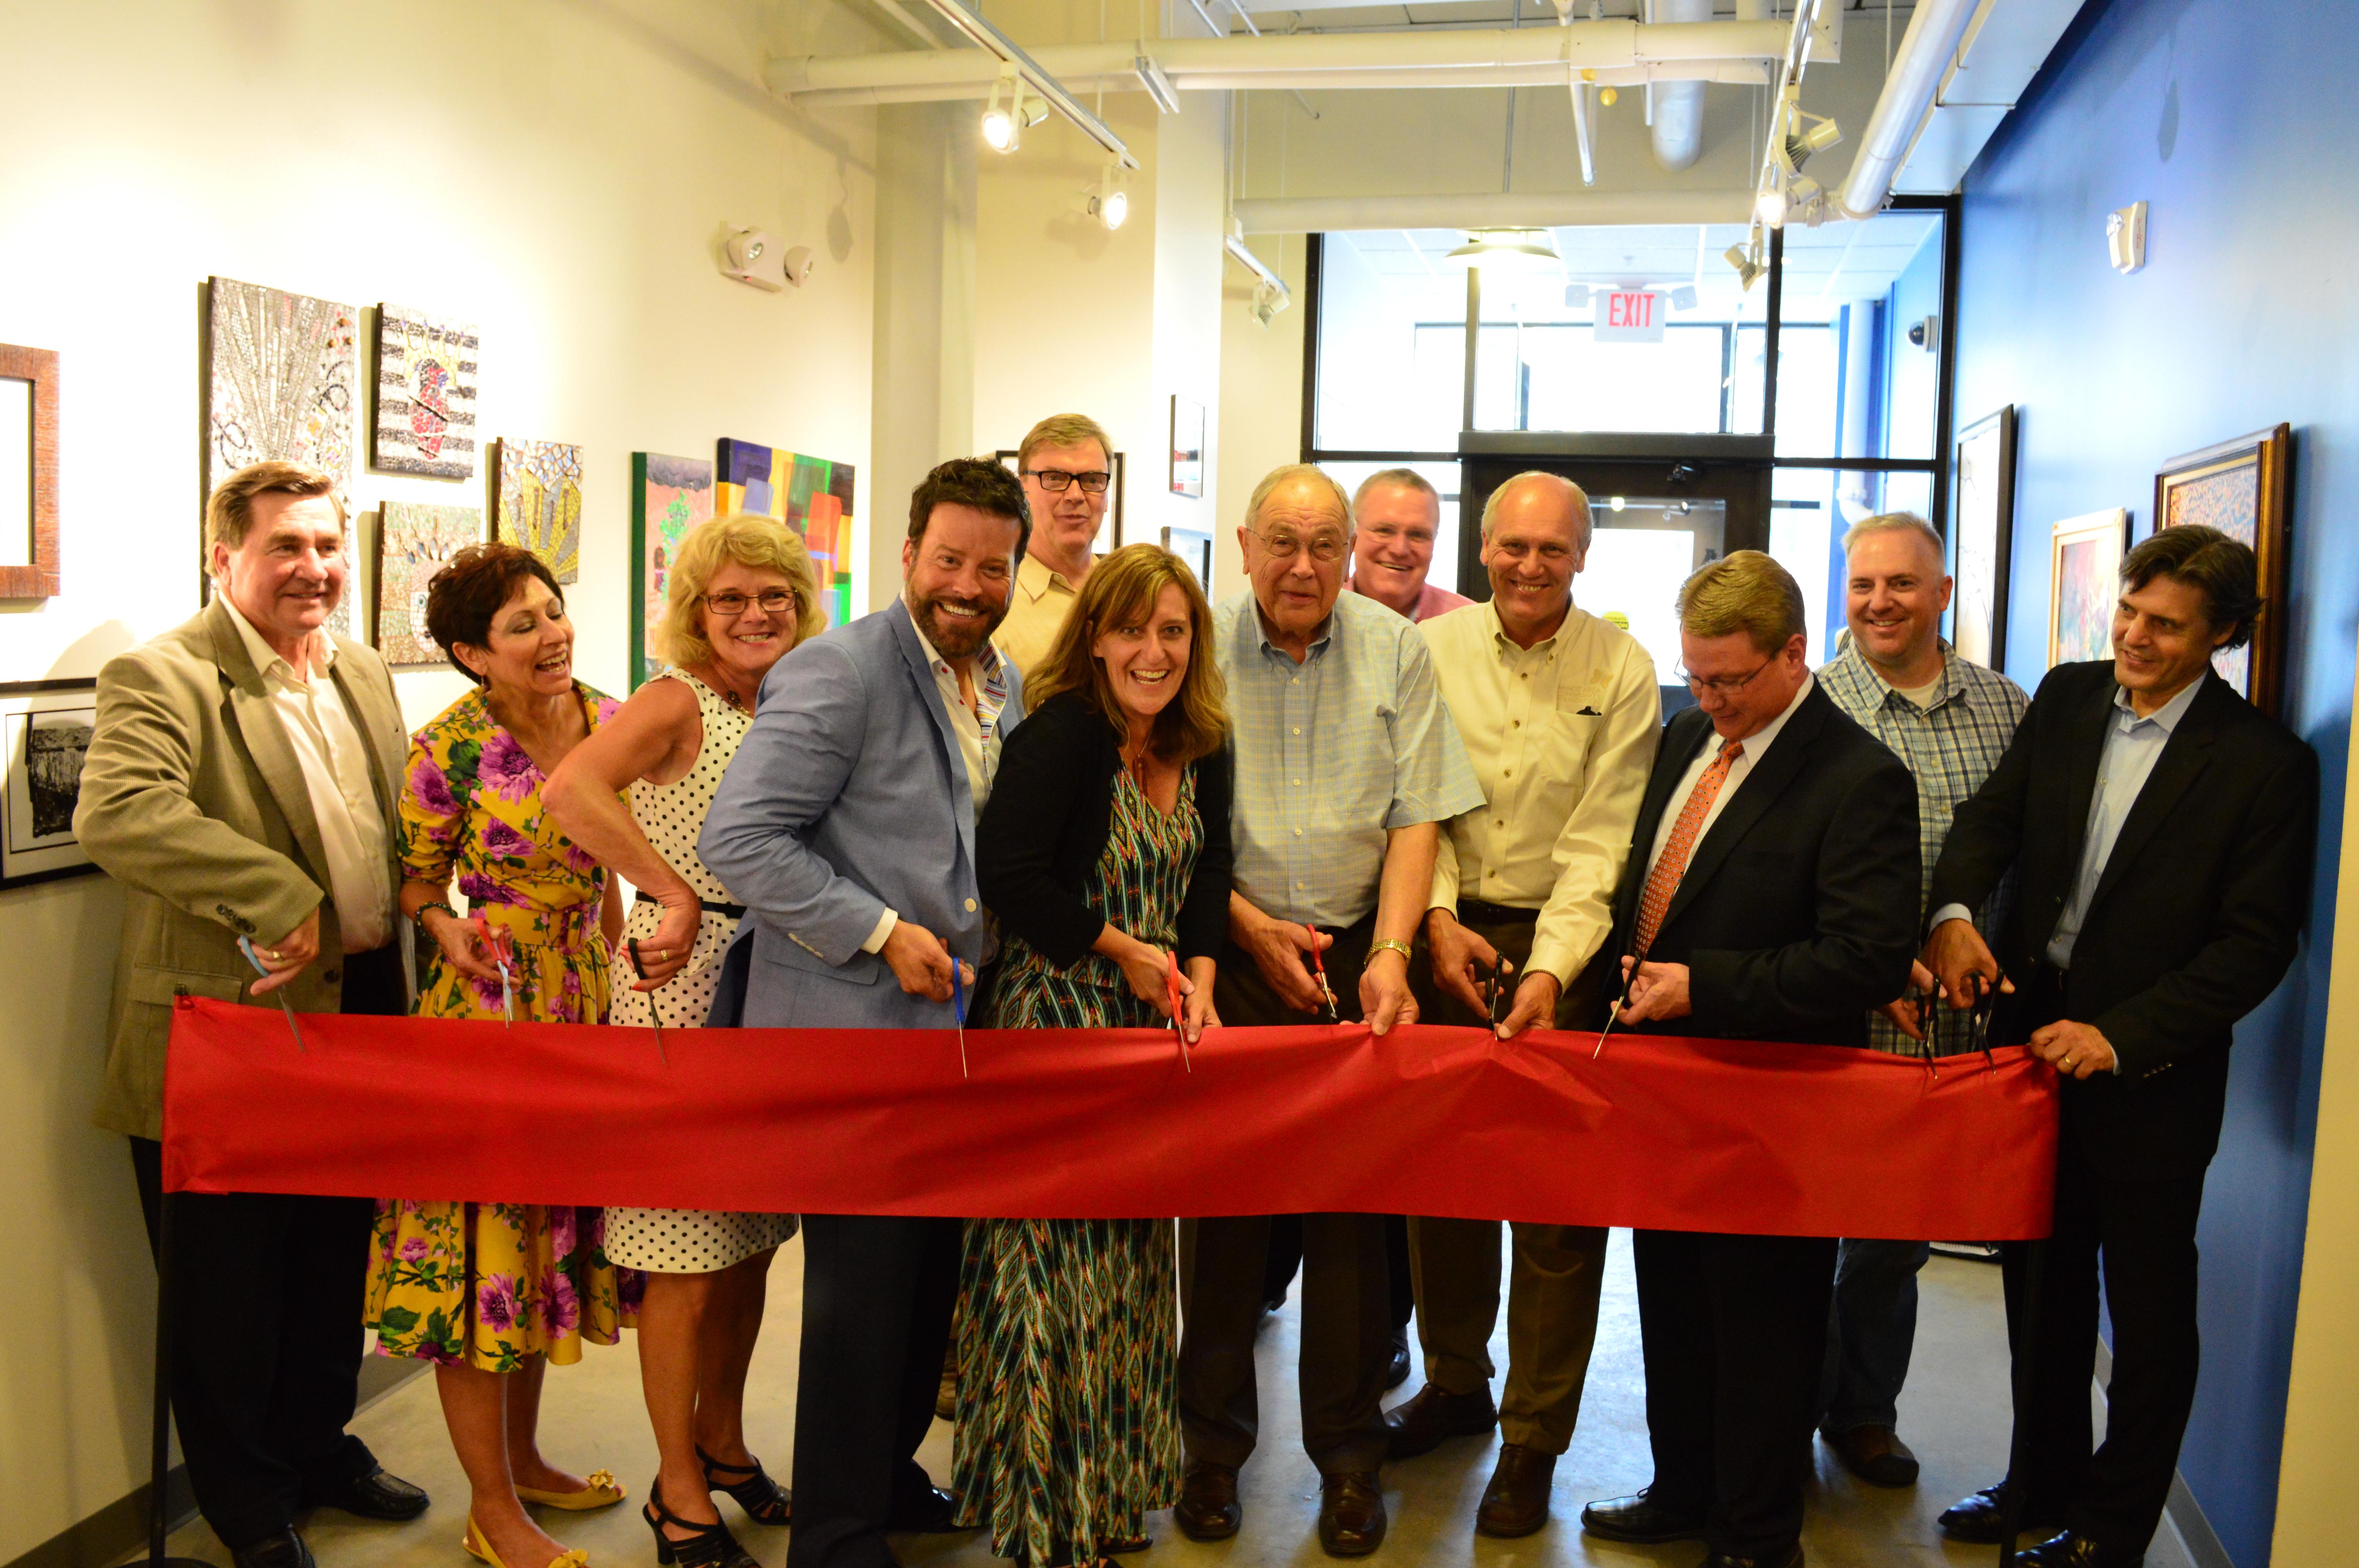 Minot Artspace Lofts Grand Opening Celebration Launches